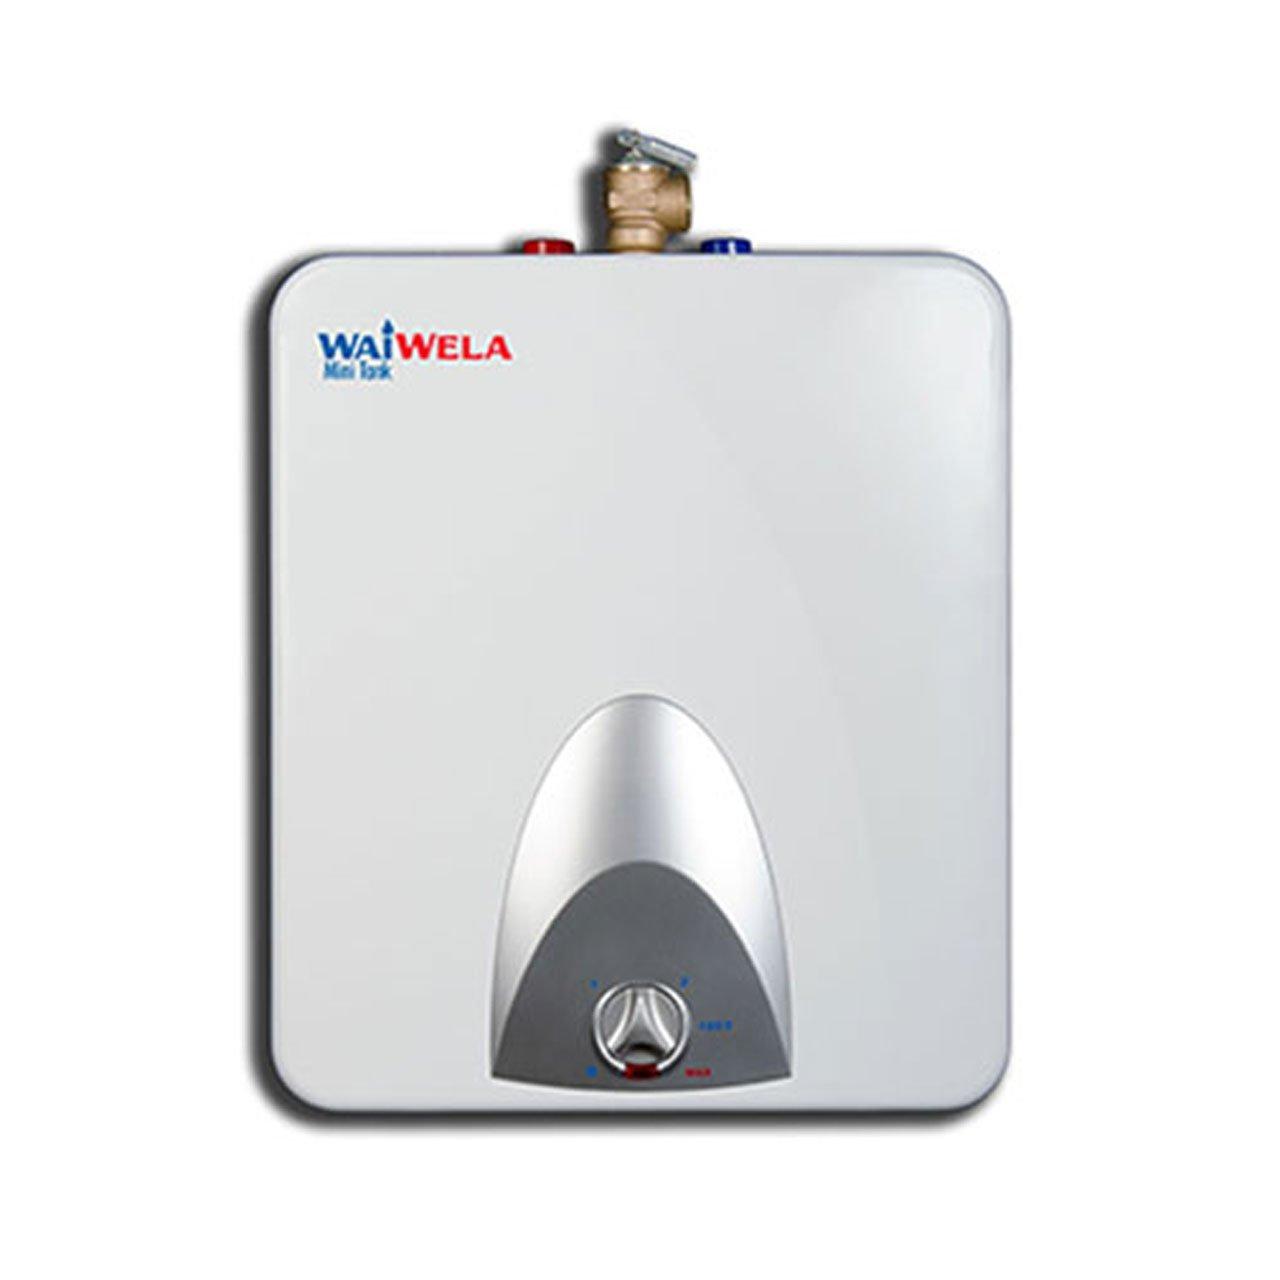 WaiWela WM-1.0 Mini Tank Water Heater, 1.3-Gallon